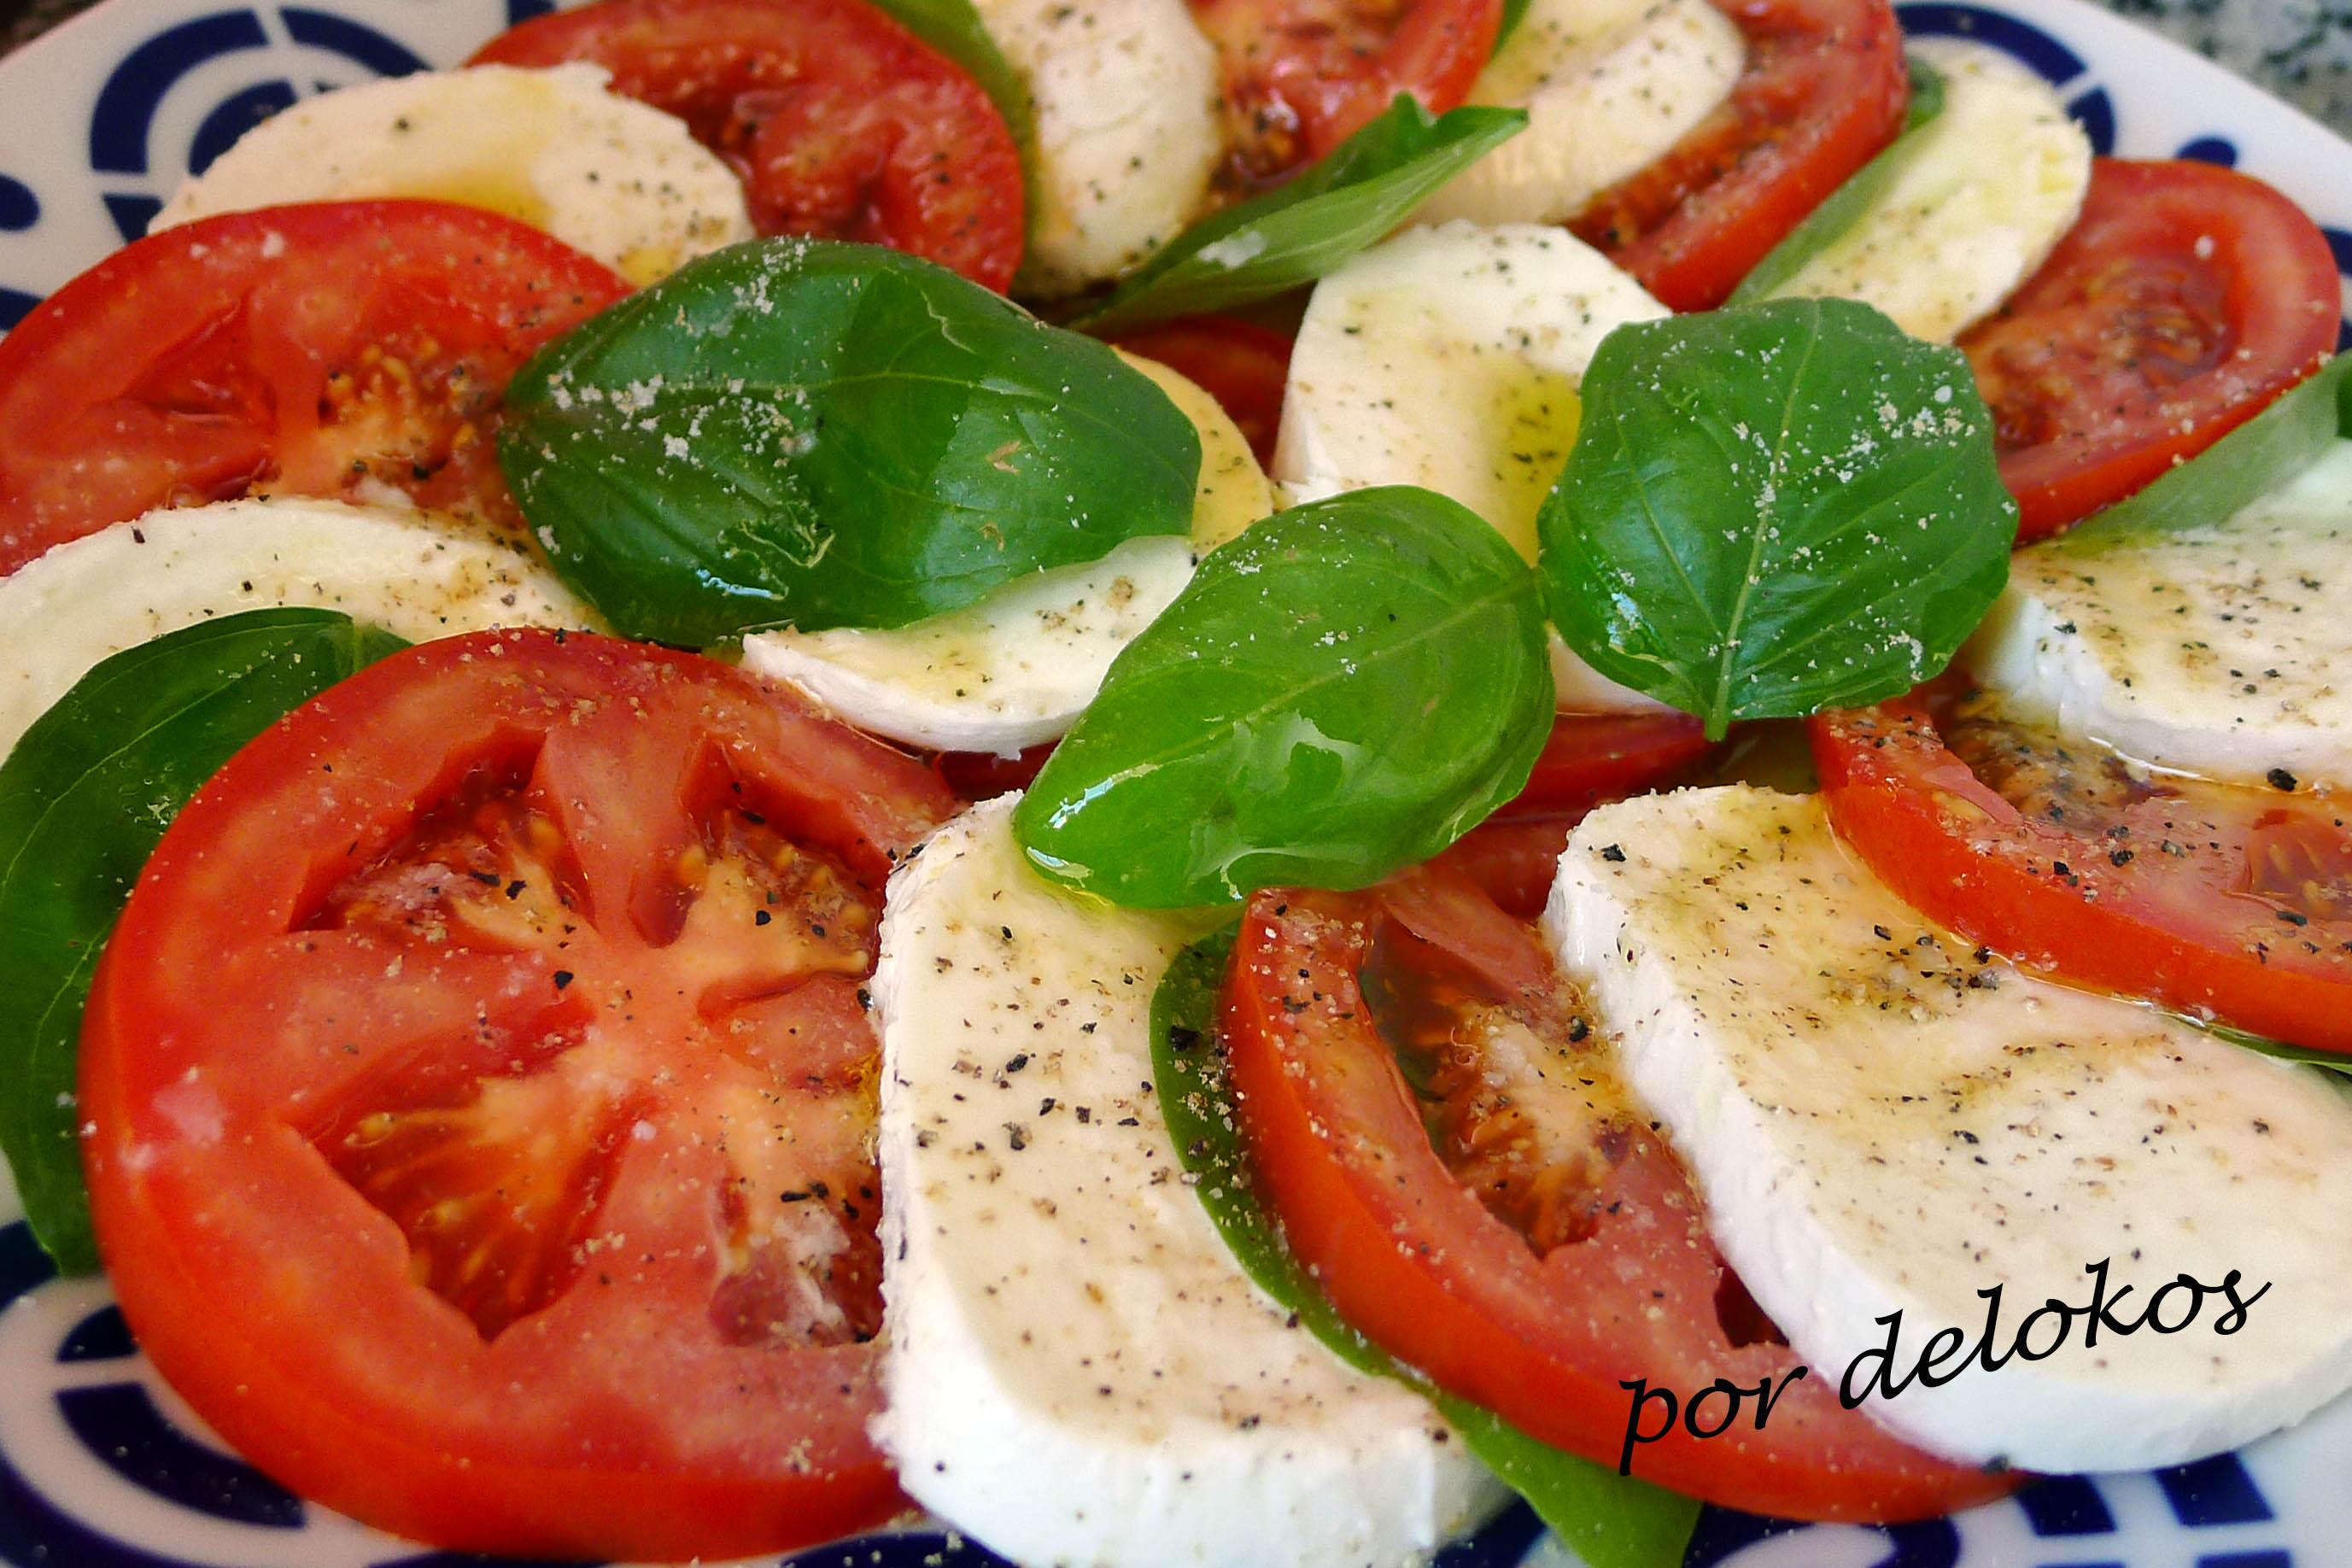 Ensalada caprese delokos for Decoracion de ensaladas